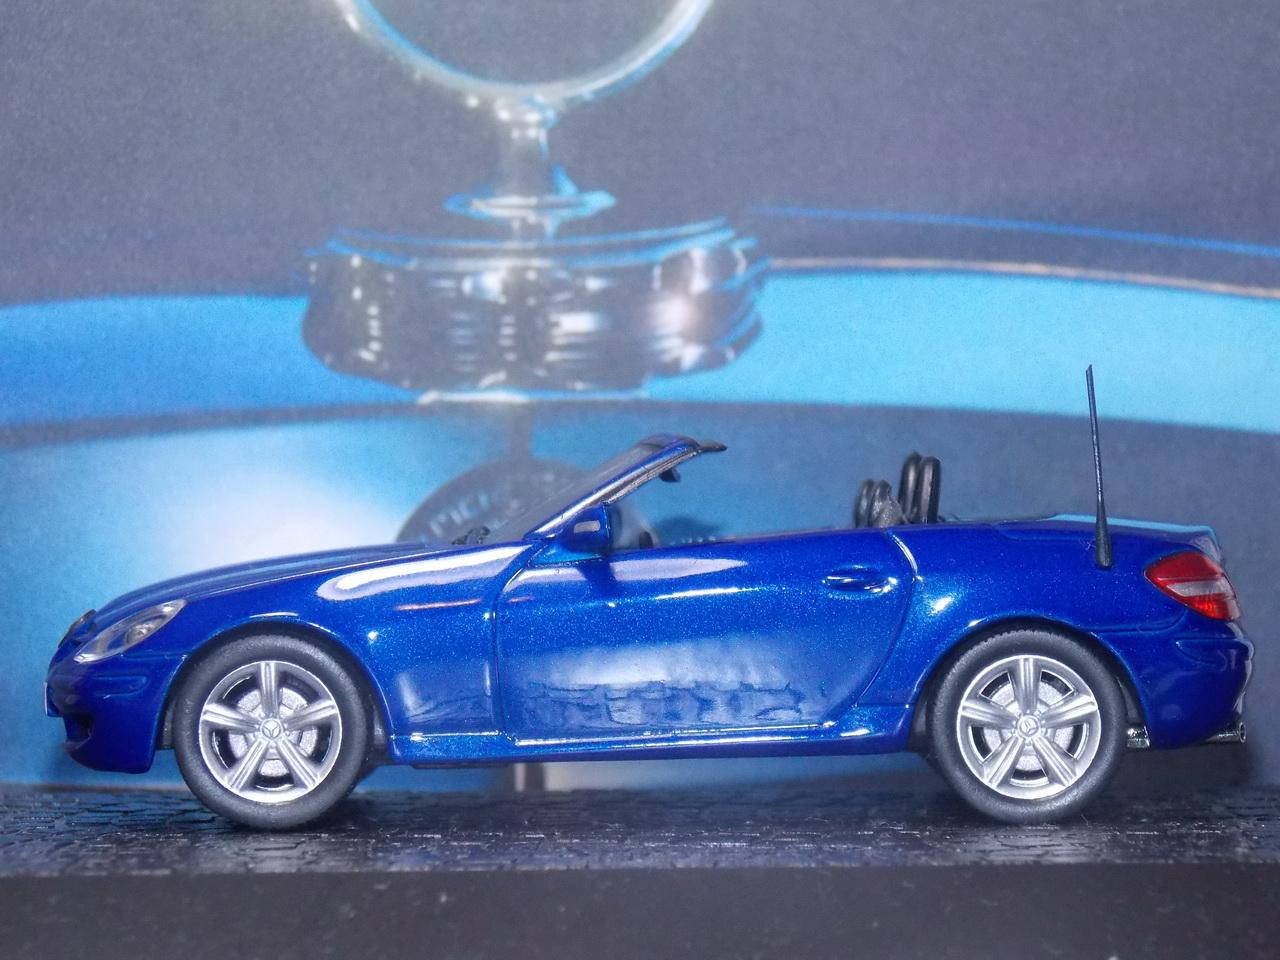 Mercedes Benz 350 SLK – 2005